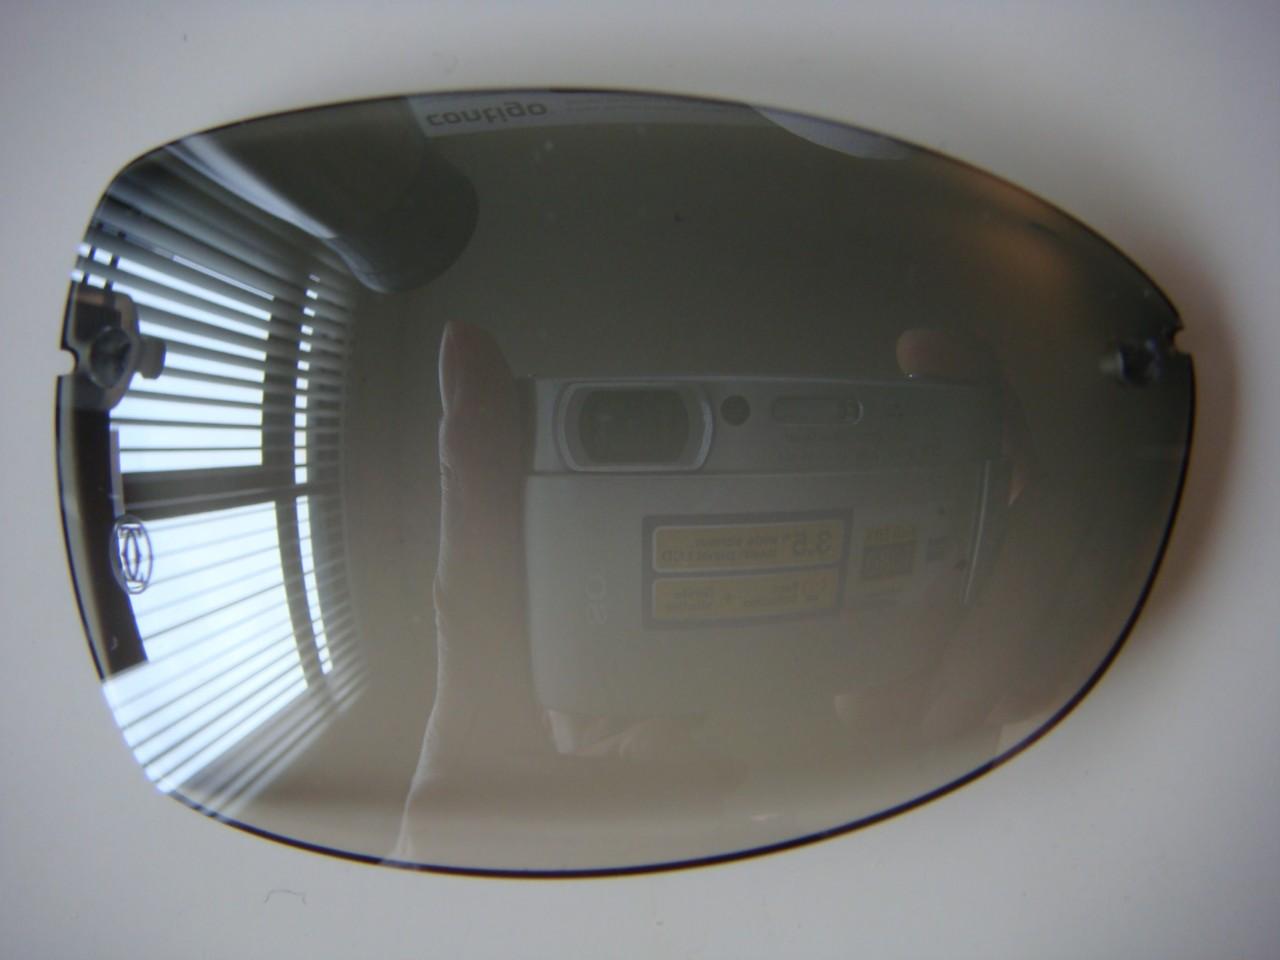 Cartier C-DECOR rimless sunglasses replacement lenses eBay